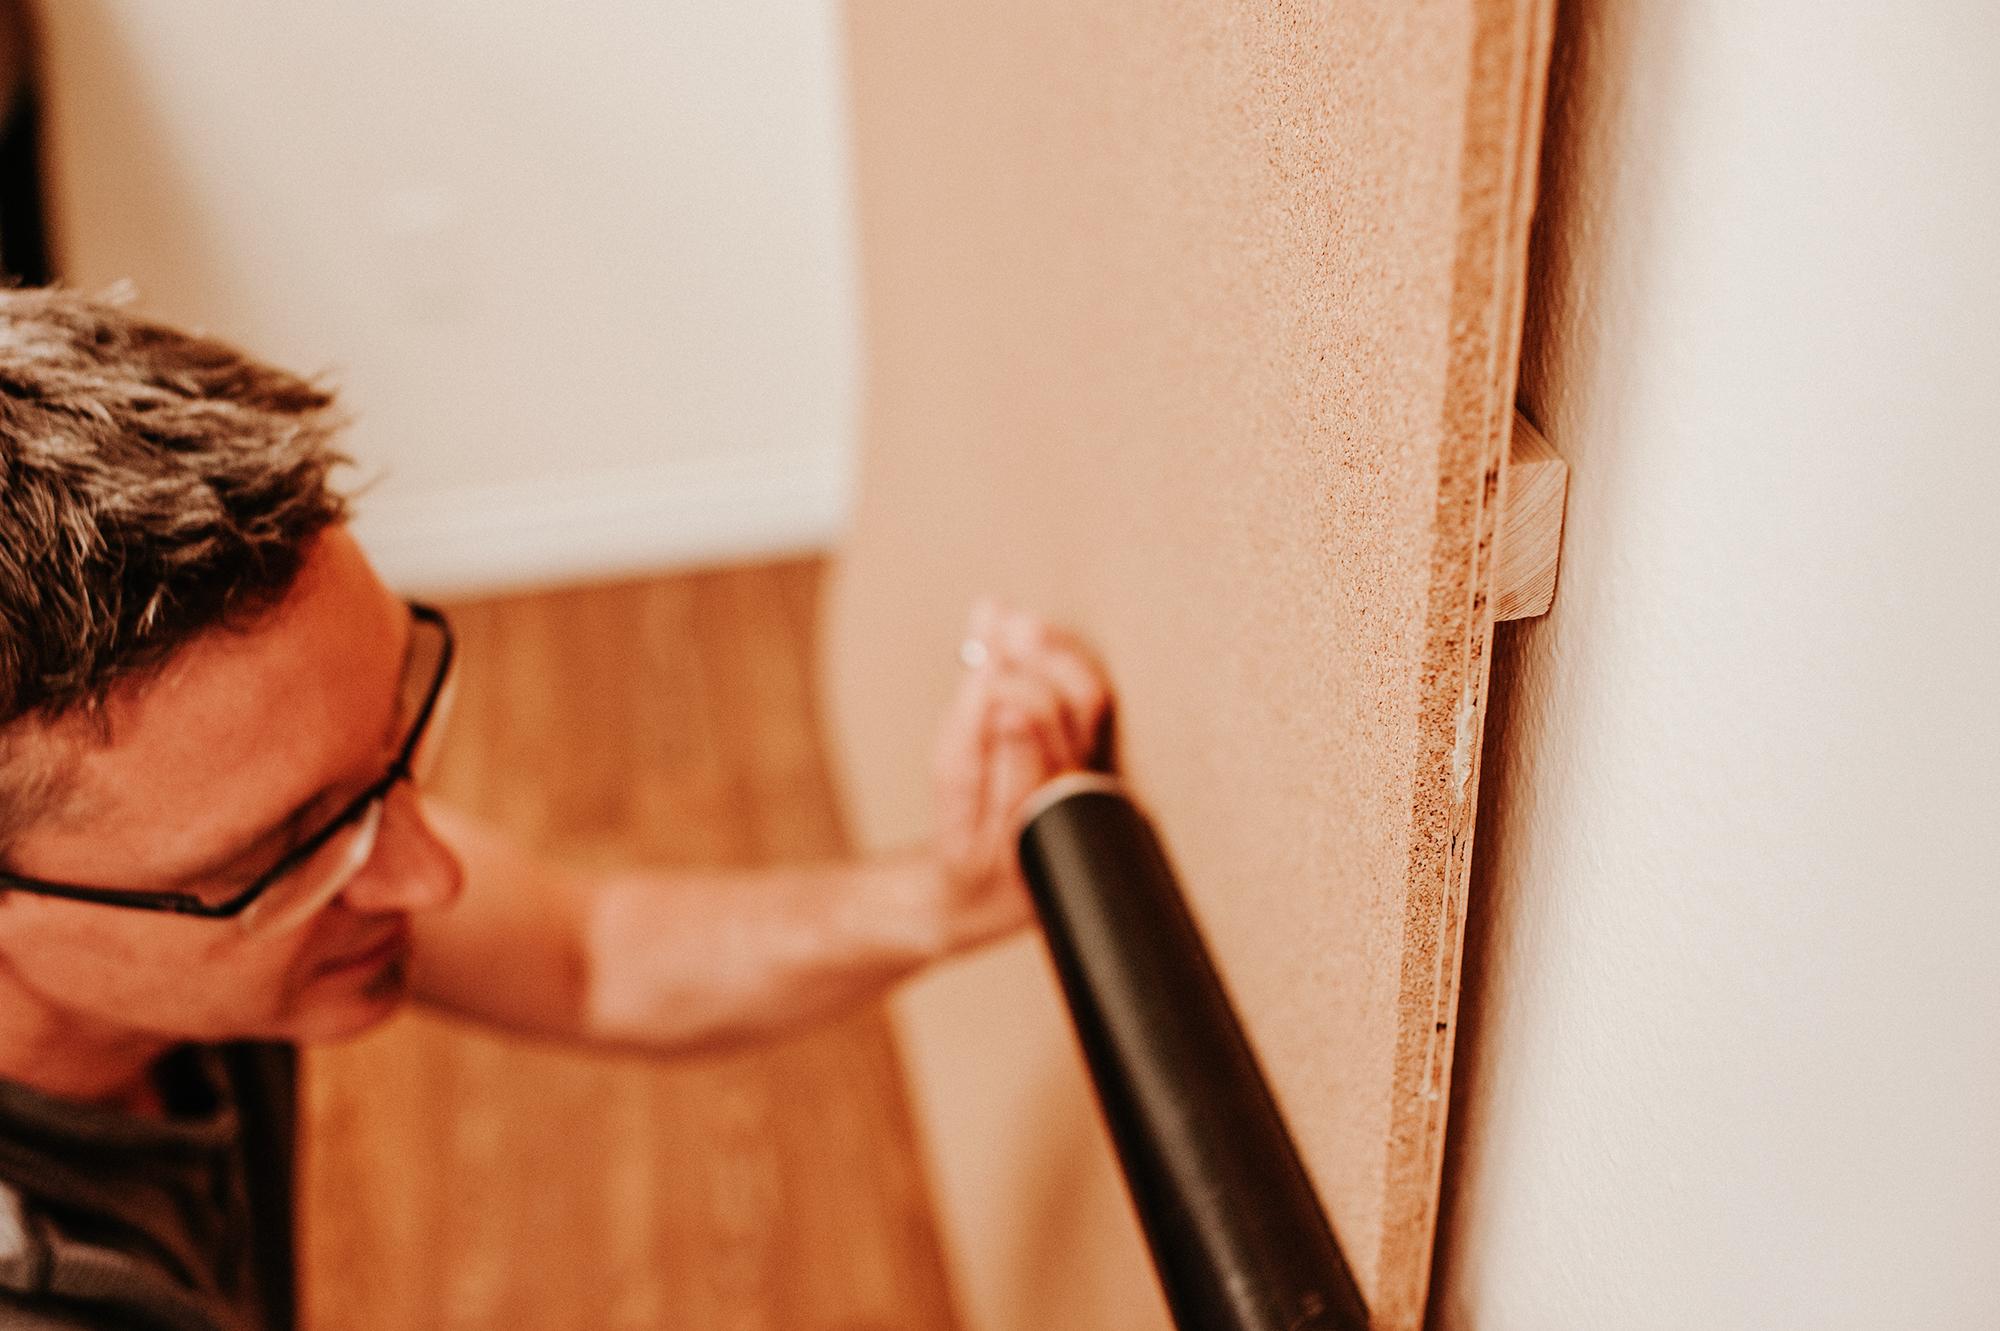 diy-cork-board-wall-how-to-install-in-office.jpg